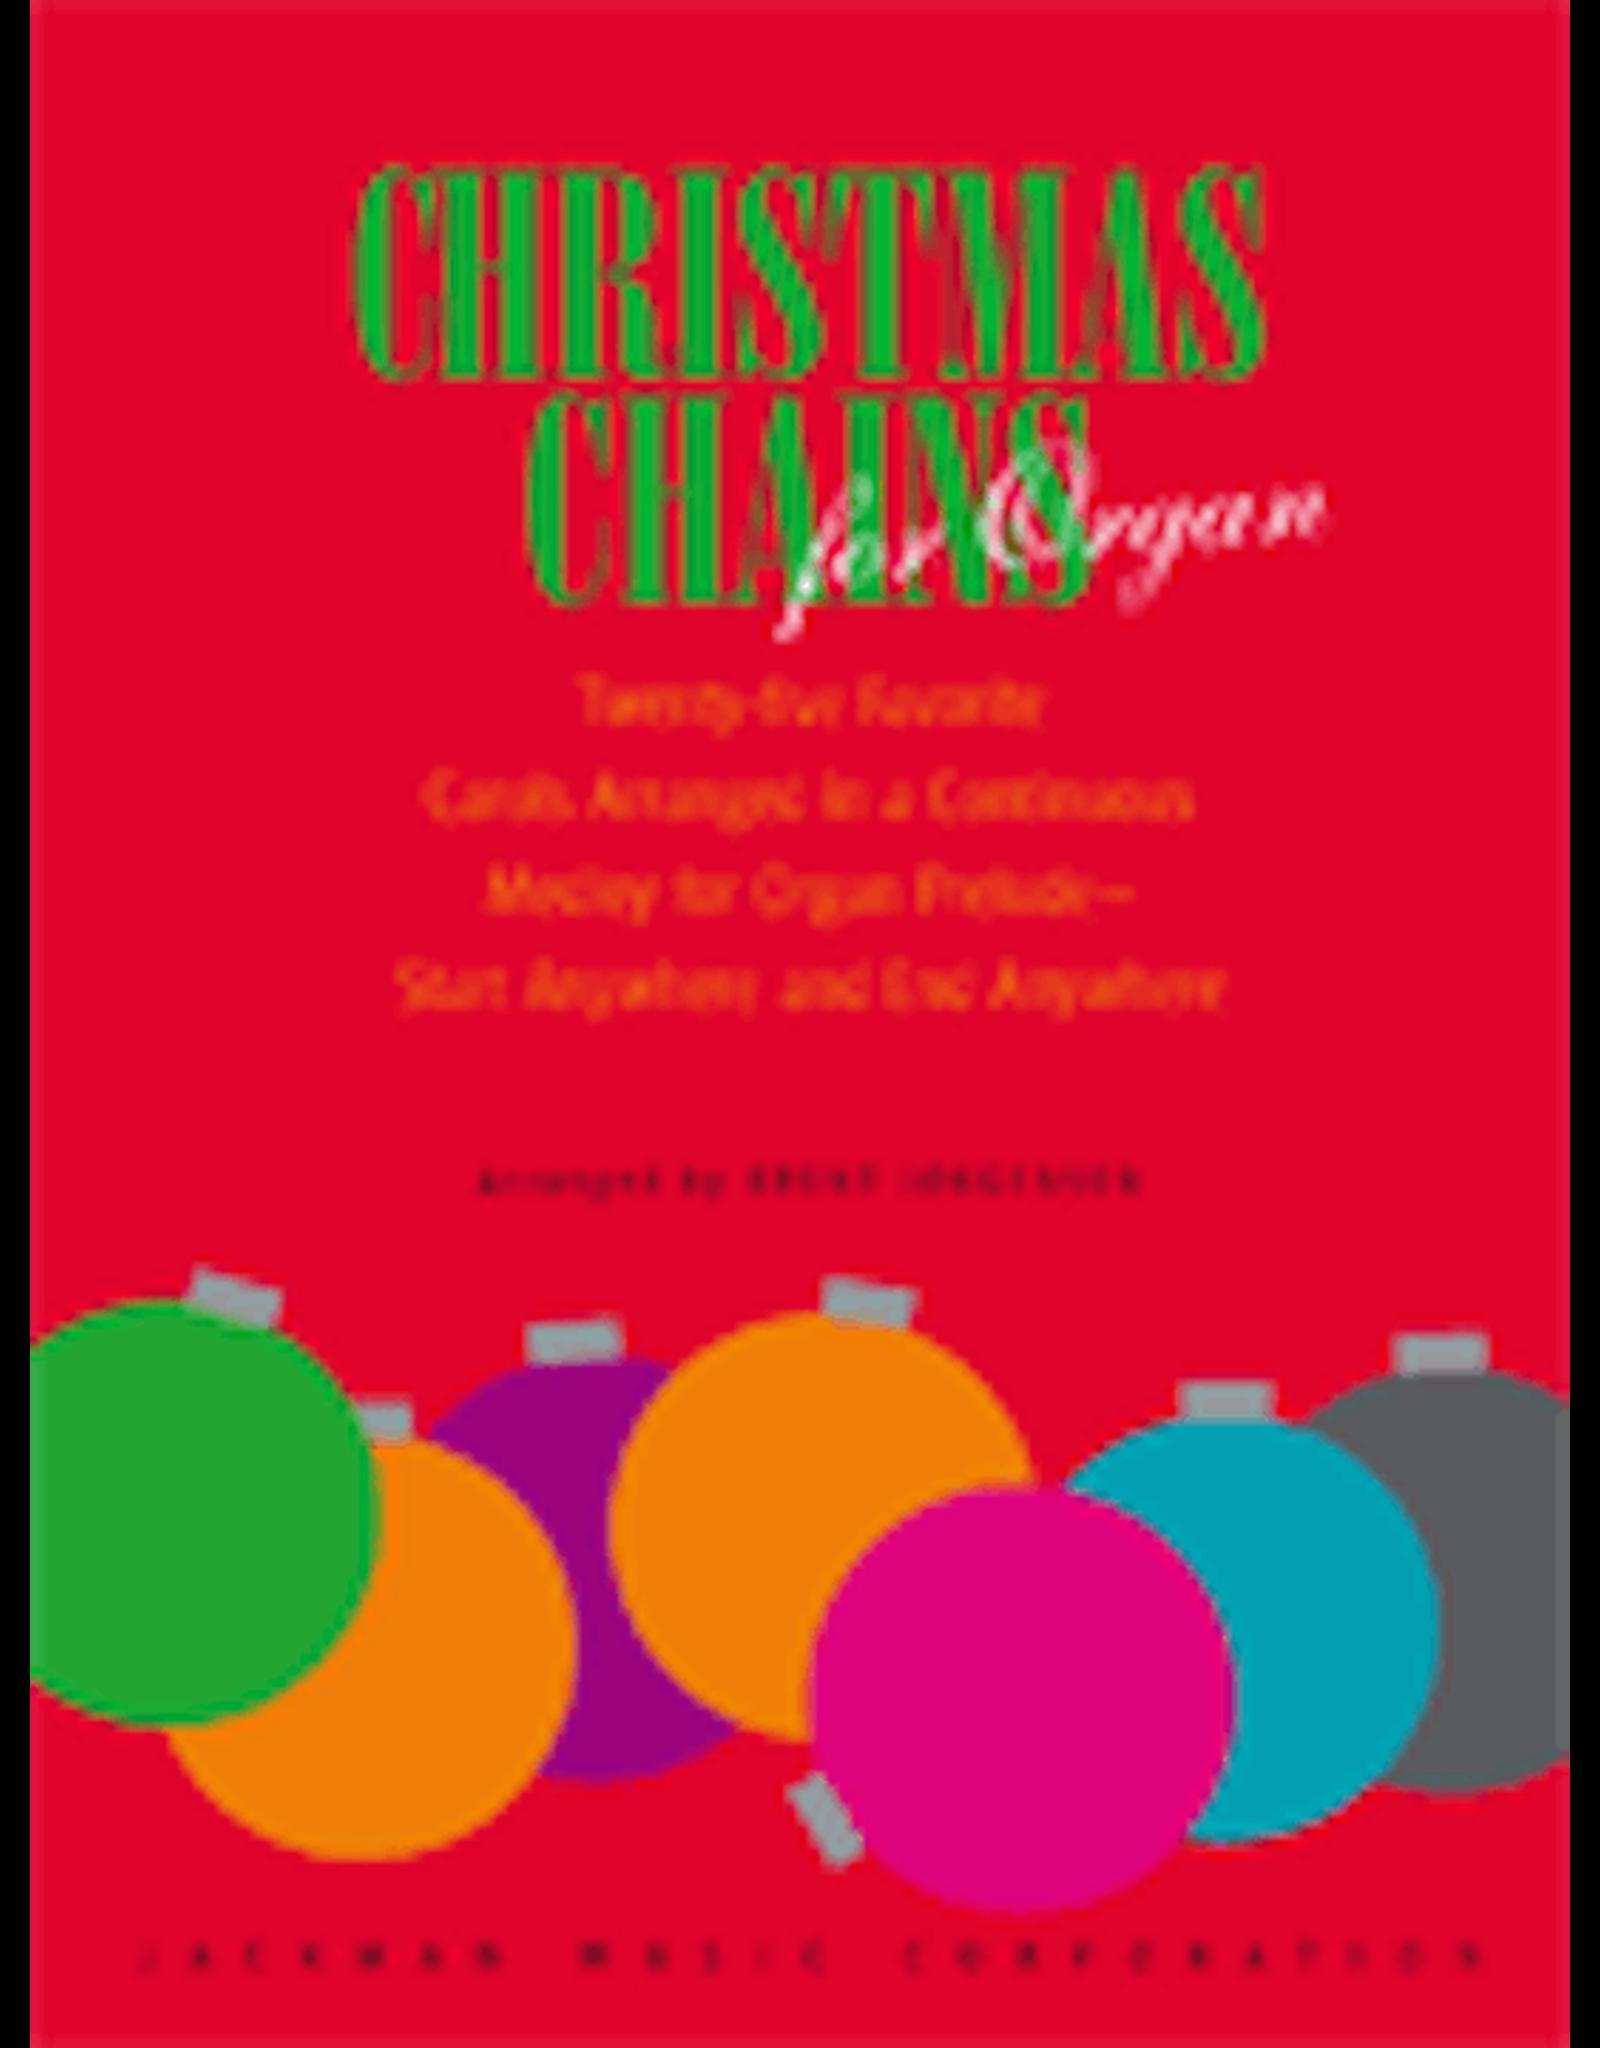 Jackman Music Christmas Chains for Organ arr. Brent Jorgensen